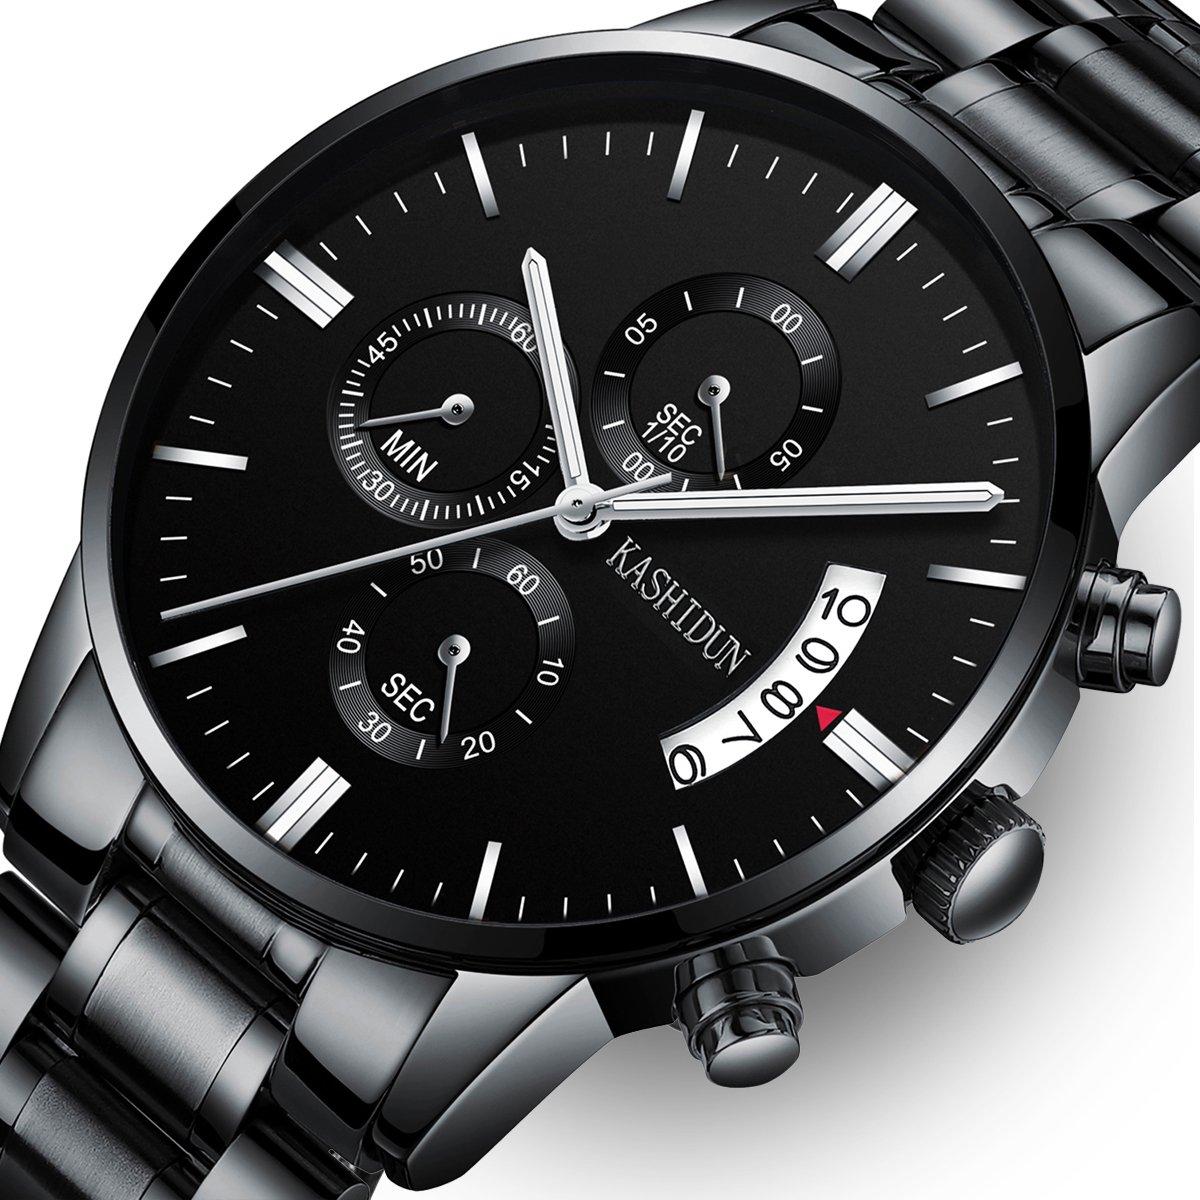 Mens Stainless Steel Watches Men Chronograph Waterproof Sport Date Quartz Wristwatch Classic Watch Black Color by KASHIDUN (Image #1)